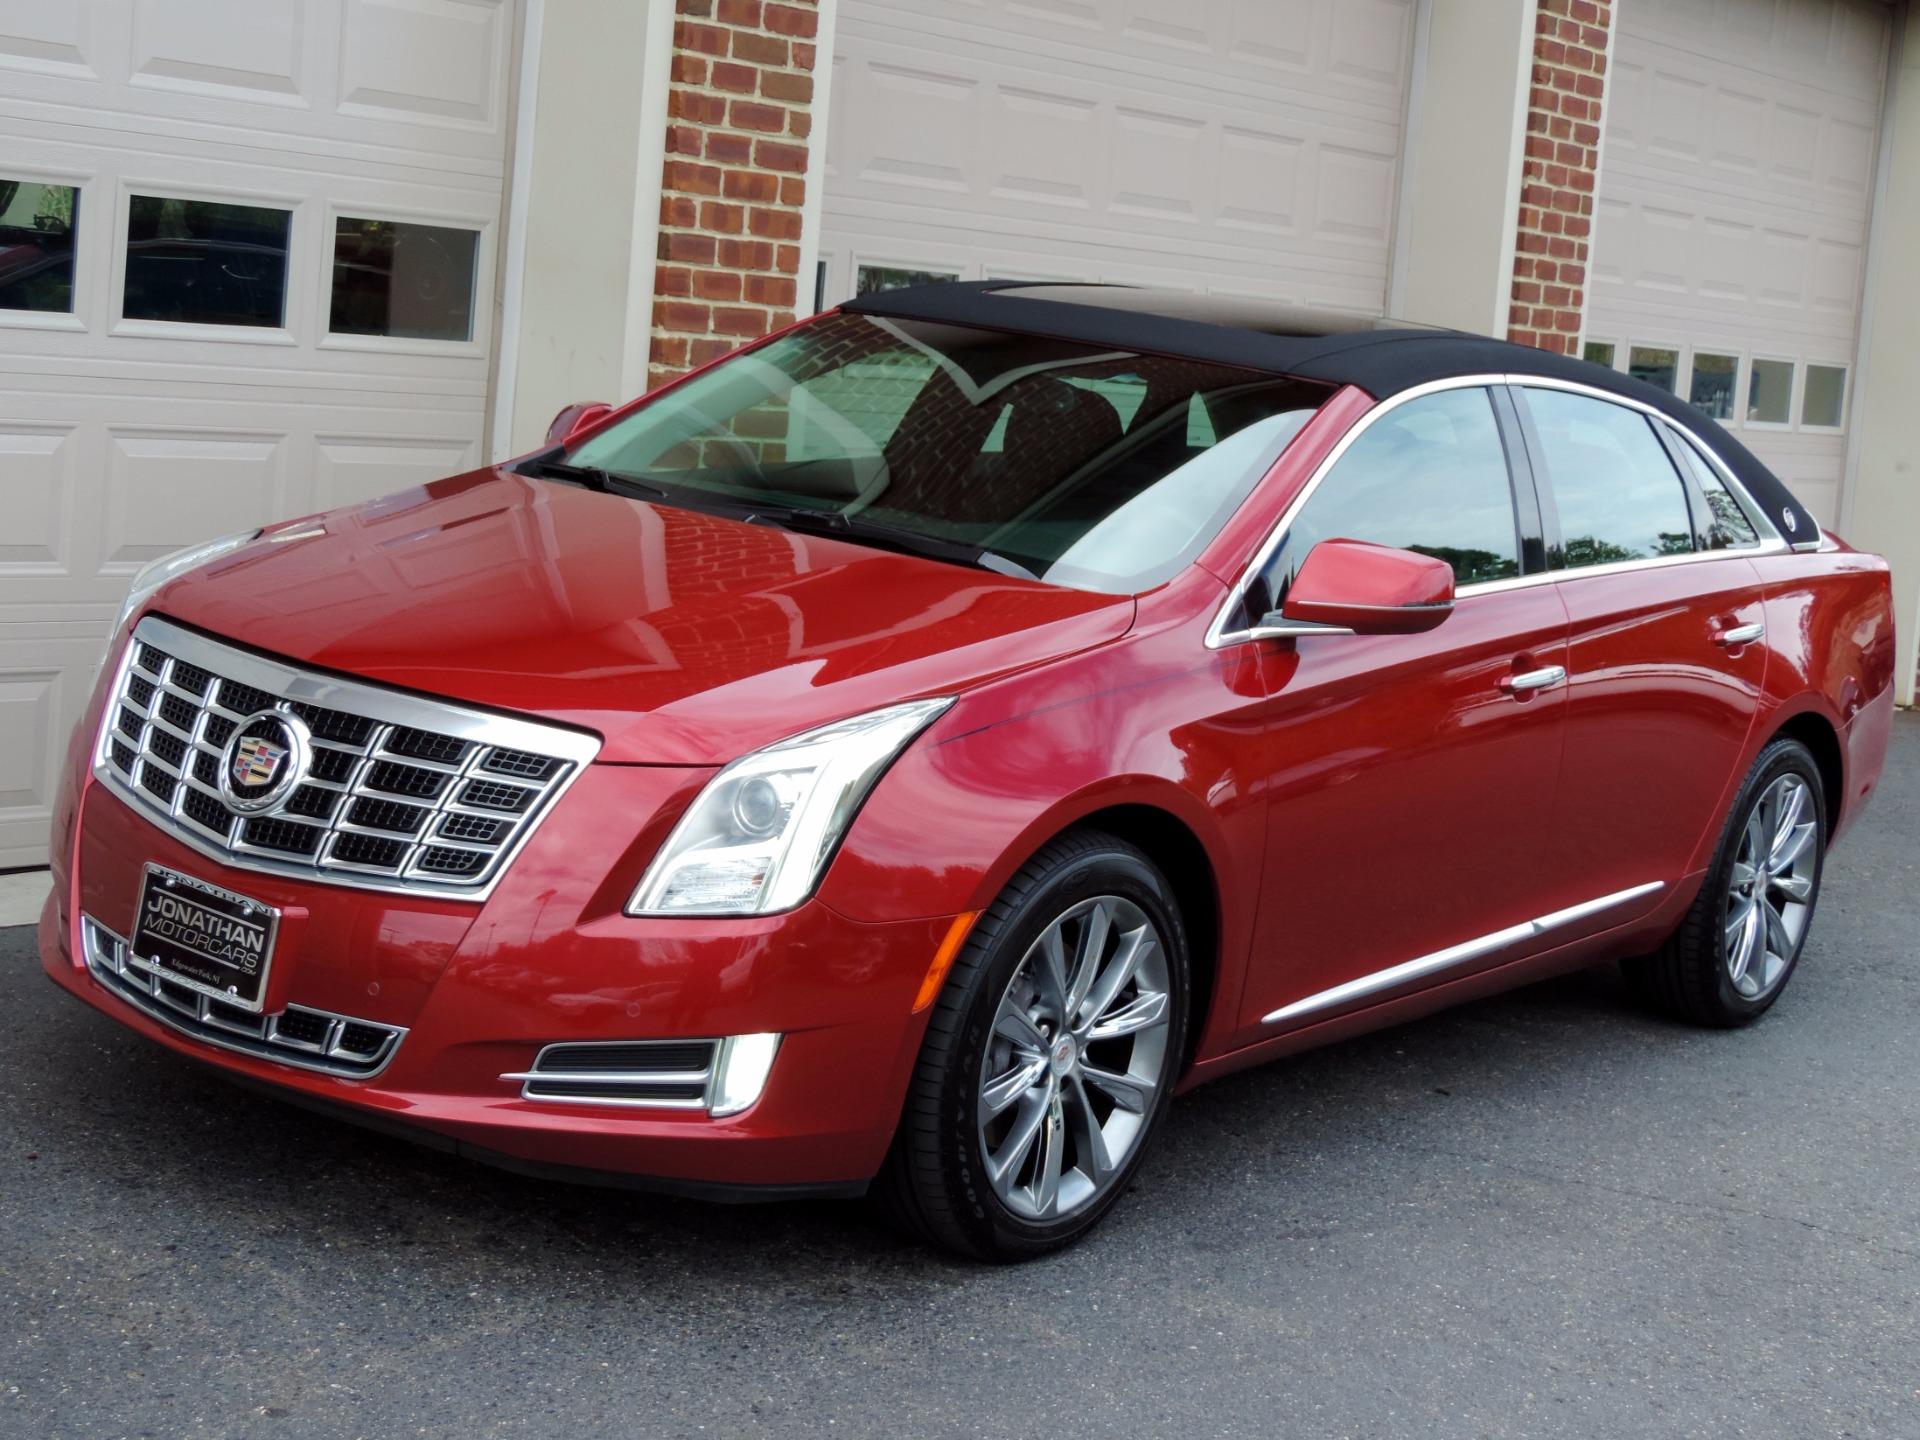 Cadillac Dealers Nj >> 2013 Cadillac XTS Luxury Collection Stock # 177277 for sale near Edgewater Park, NJ | NJ ...